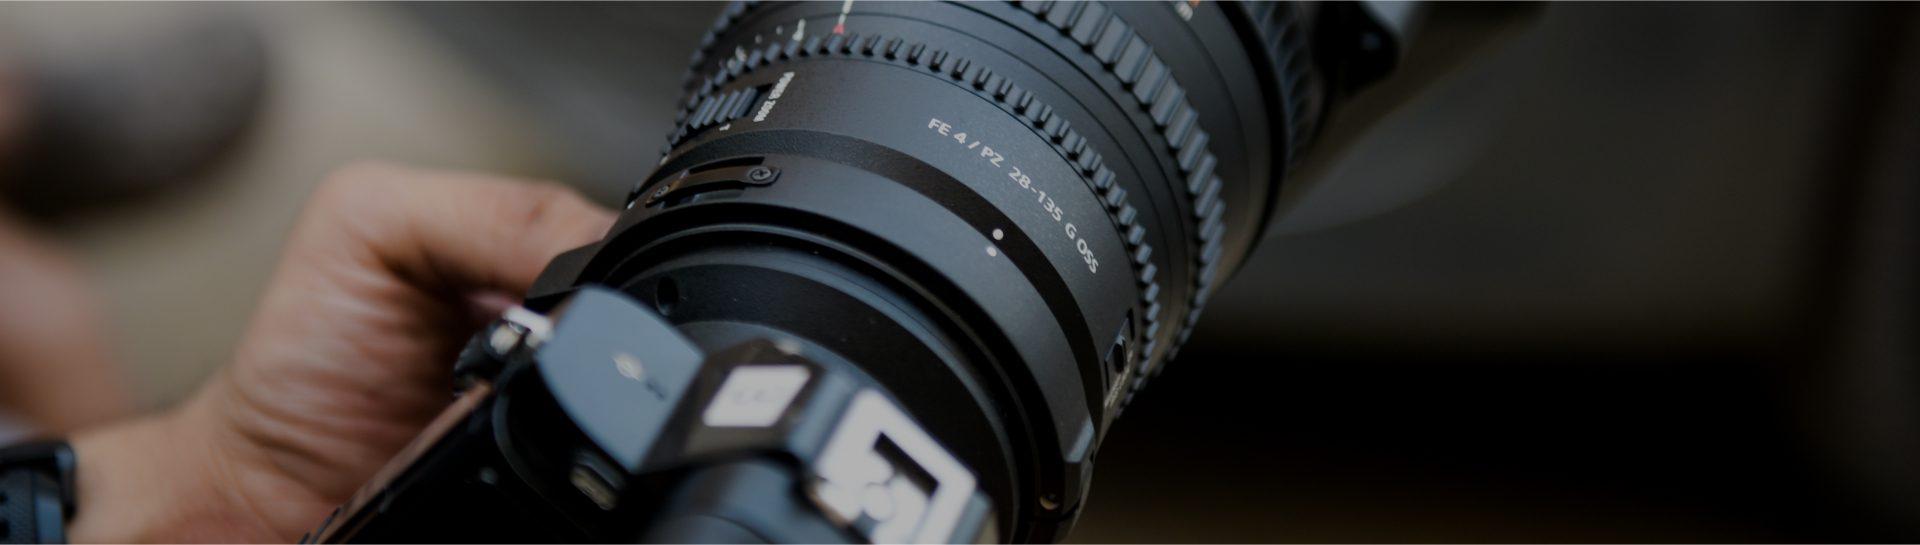 Fotografie - atelier